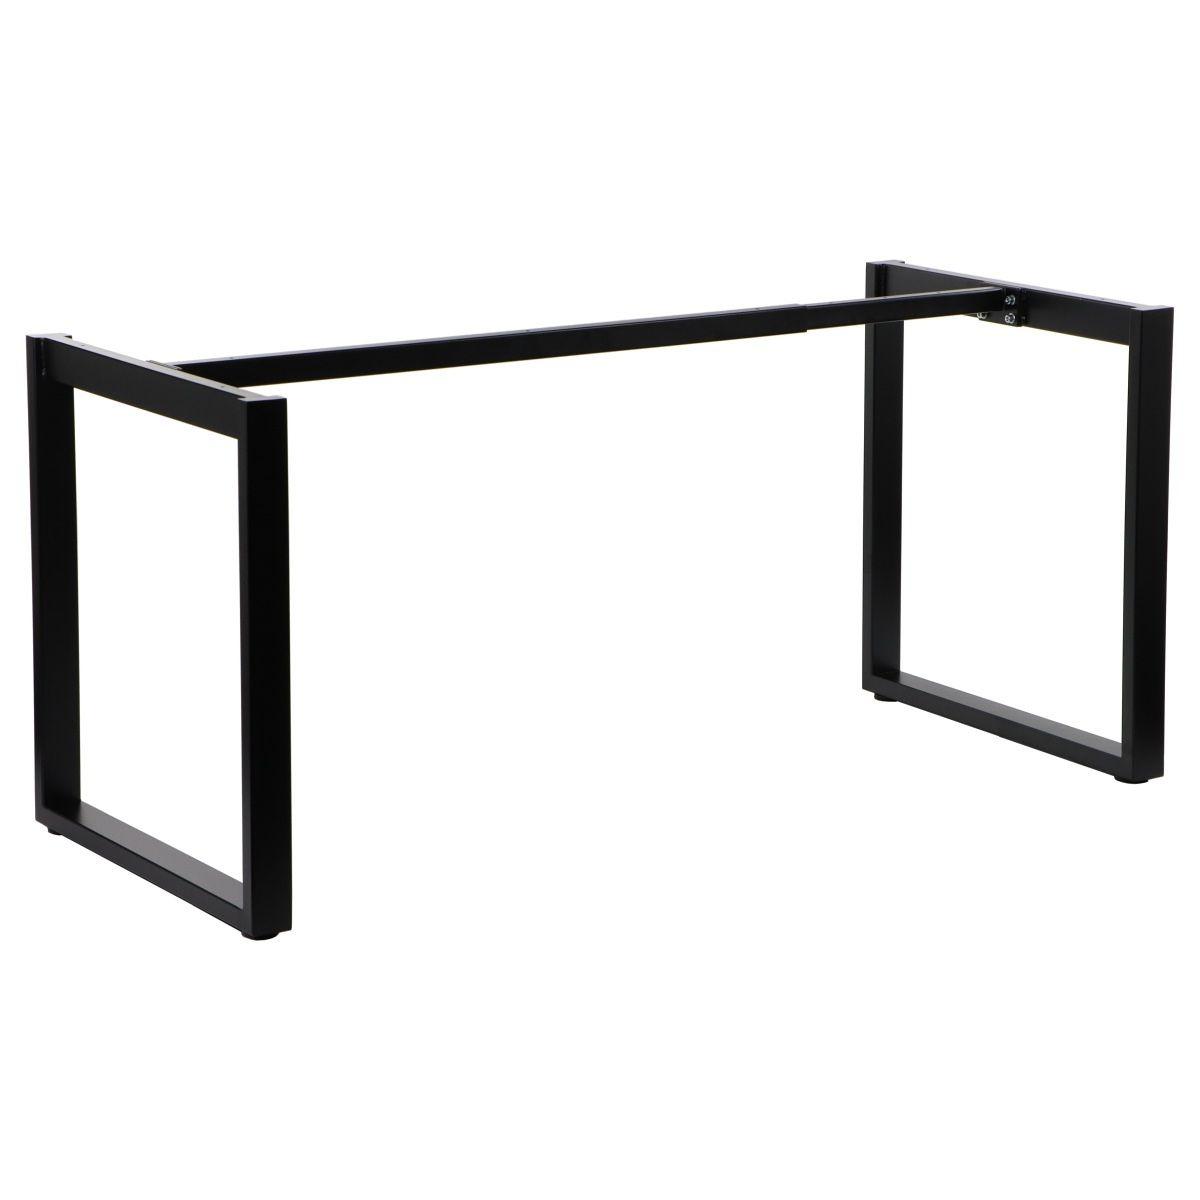 Stelaż skręcany do stołu i biurka EF-NY-131 czarny 159,6x69,6 cm